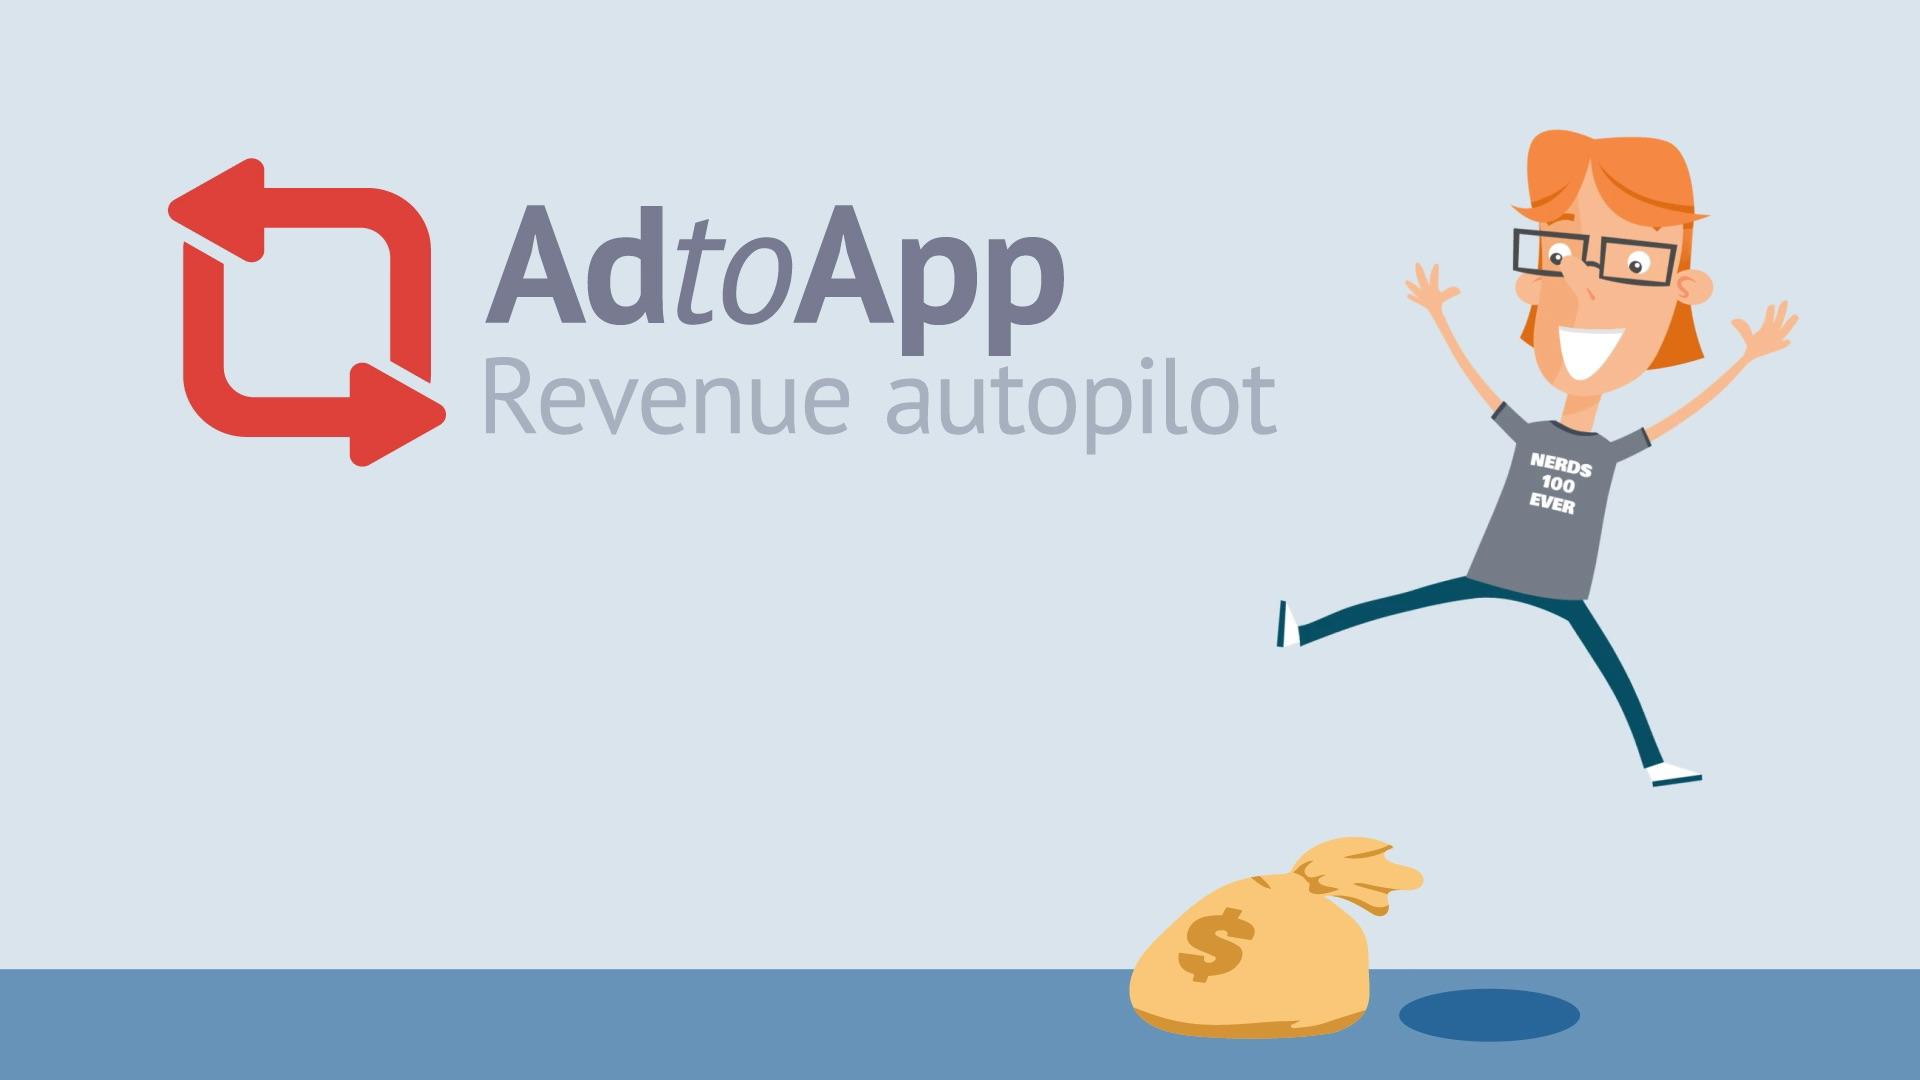 AdToApp explainer video